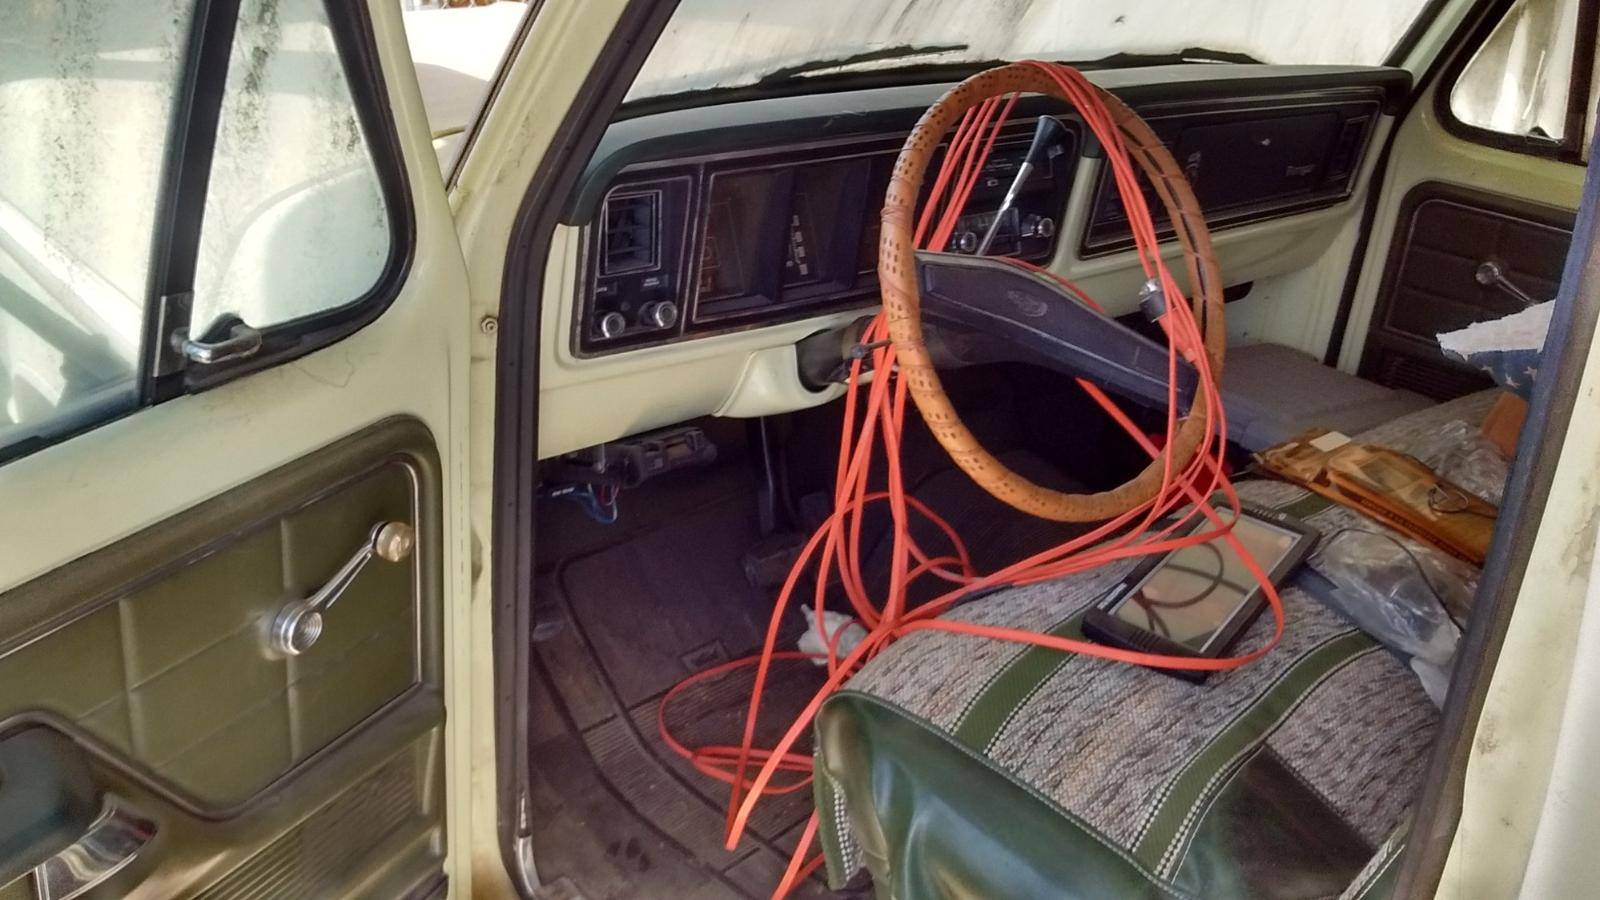 1975 Ford F-250 Gets the Full PreRunner Treatment